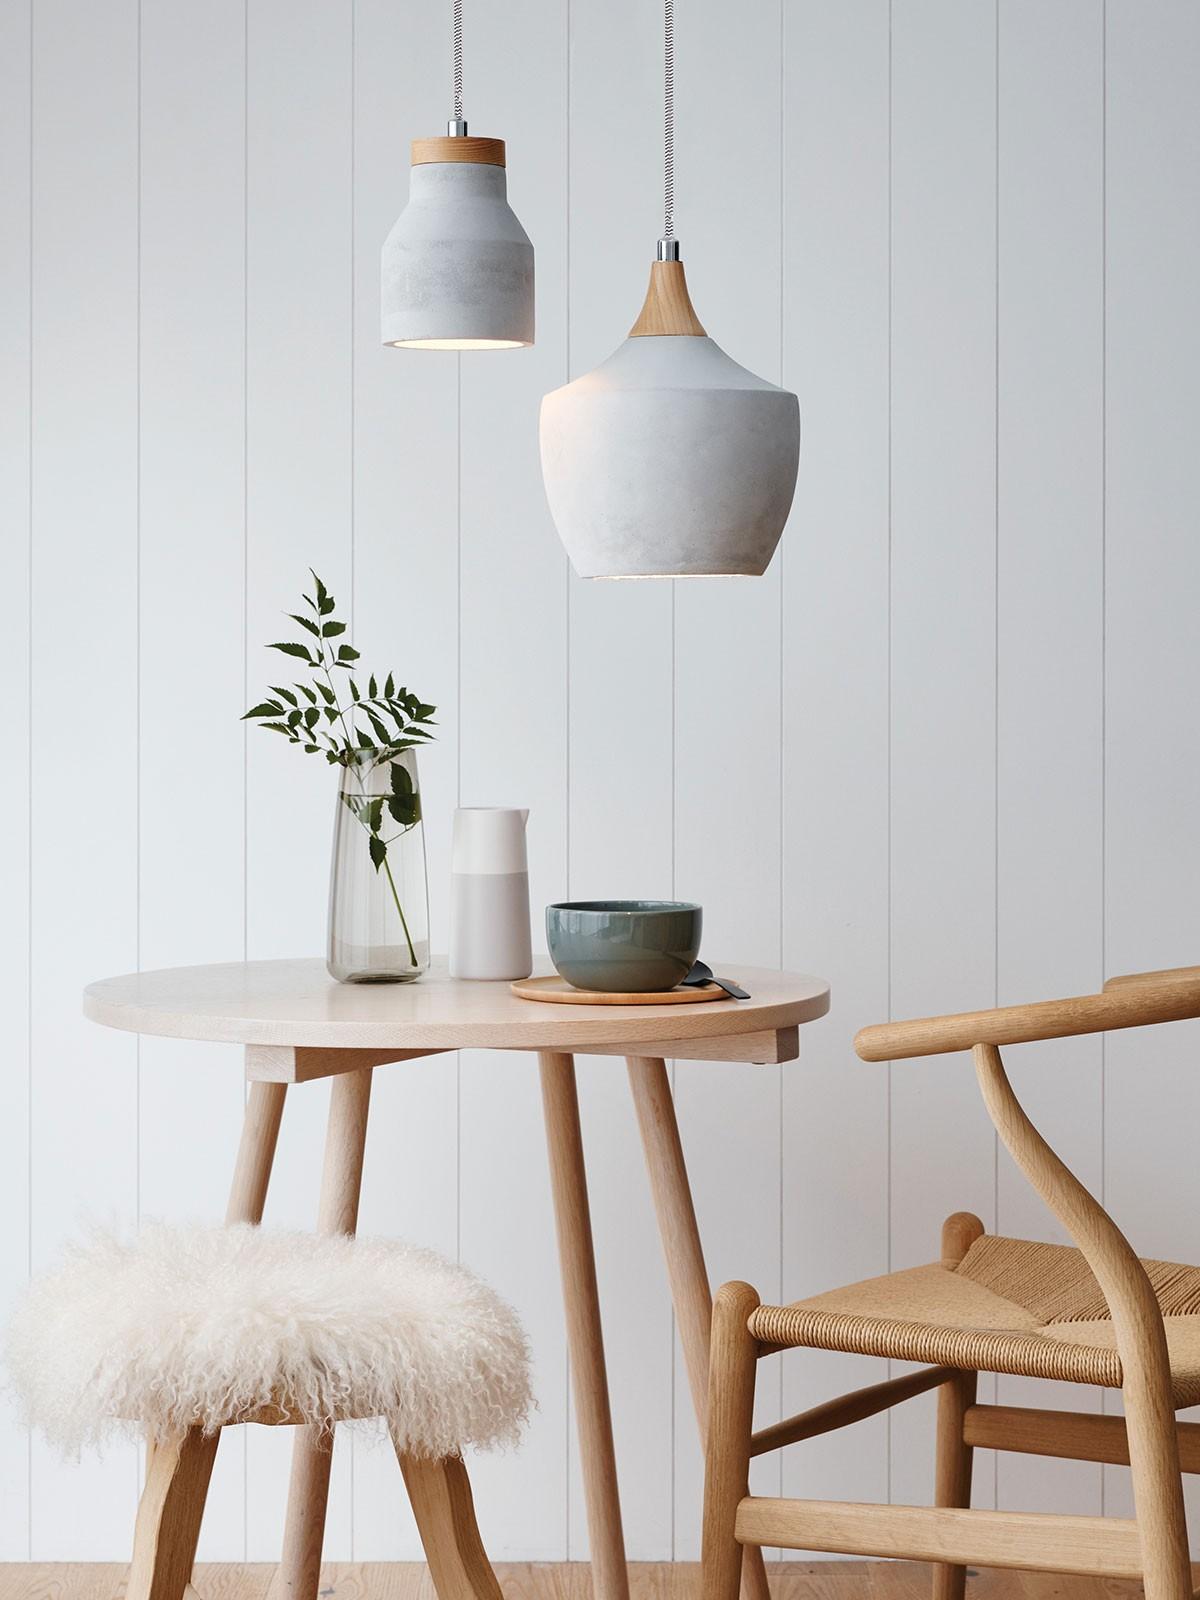 scandinavian lighting design decor tips ideas hygge lighting pendant lights neutral home style | Top 5 Scandinavian Home Decor Style Tips featured by popular US blogger Style Elixir